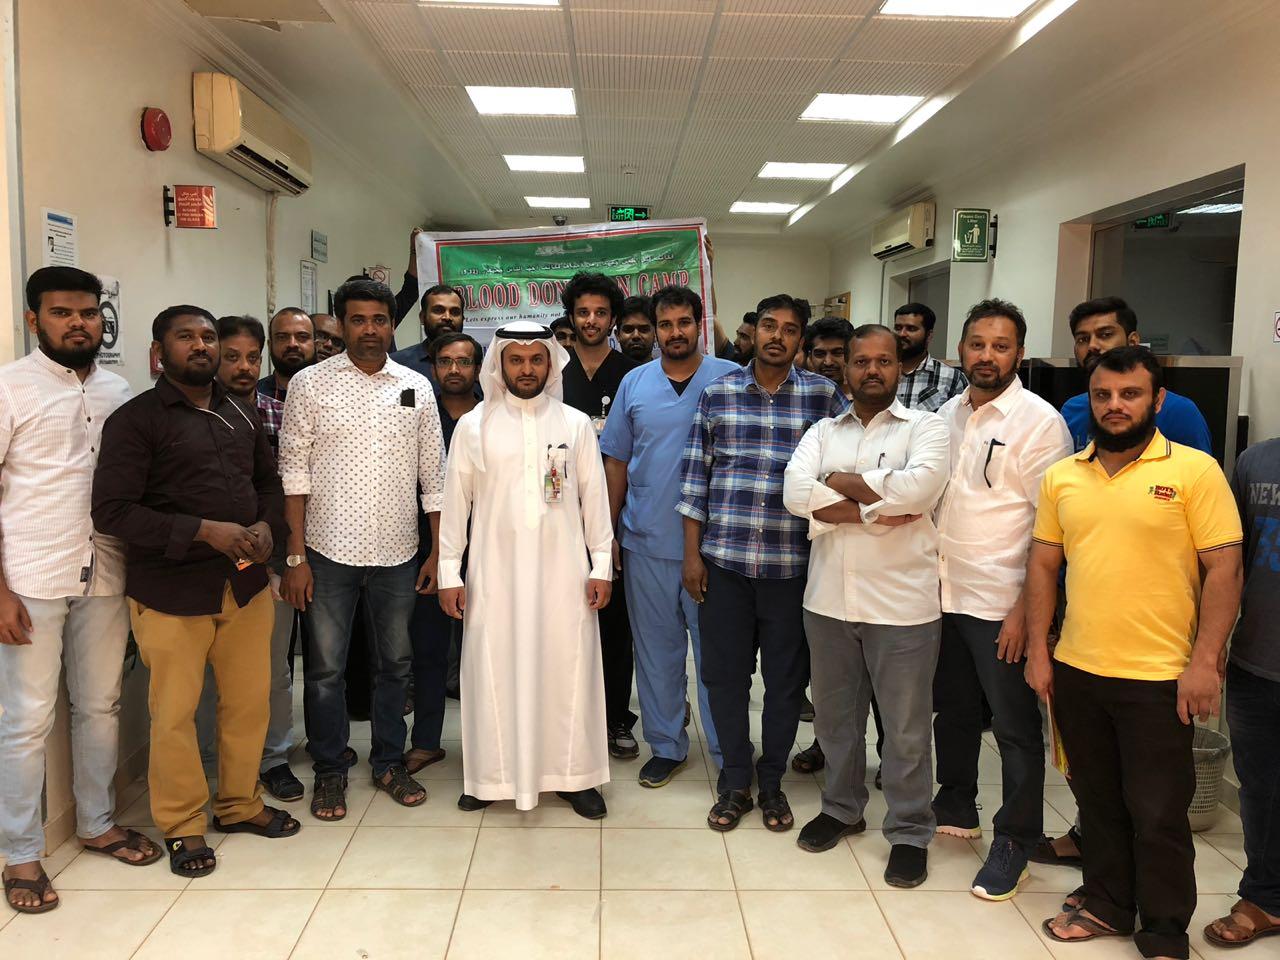 TNTJ organizes massive blood donation camp for 2018 Haj pilgrims.